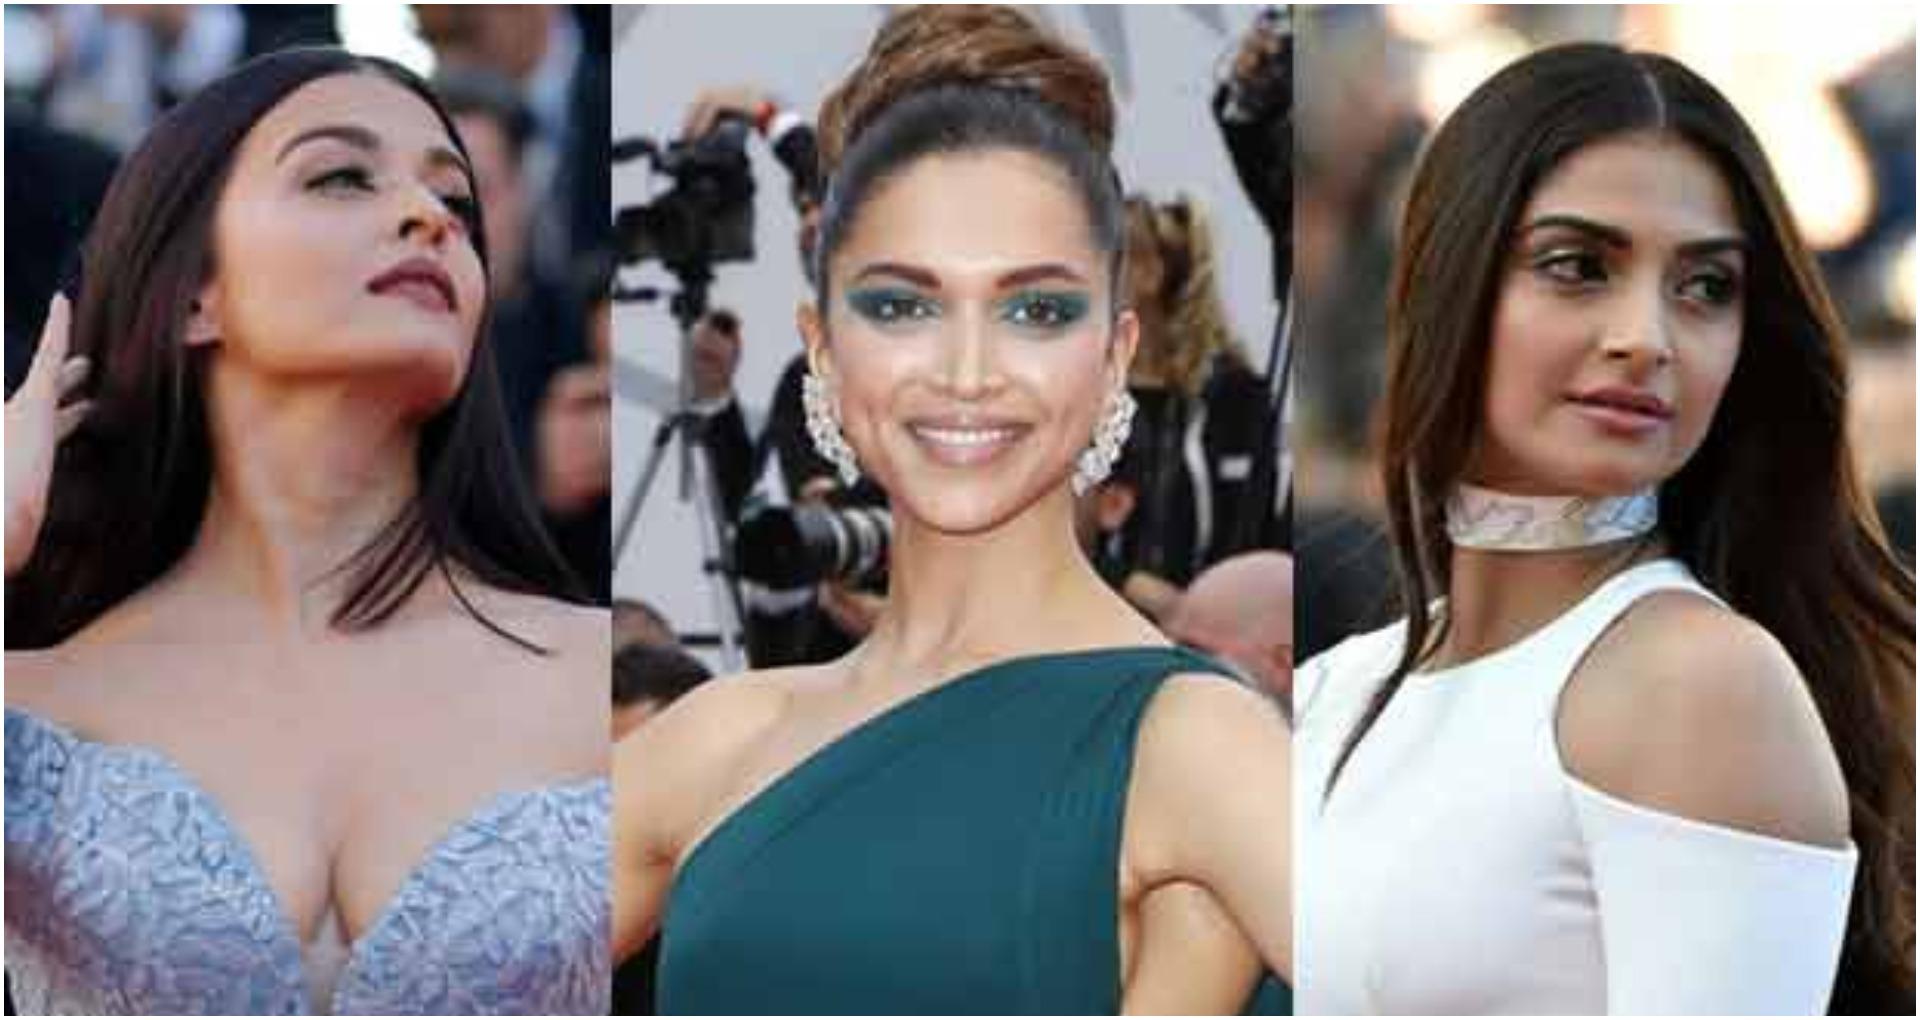 Cannes Film Festival 2019: दीपिका, सोनम, ऐश्वर्या सहित TV की ये पॉपुलर एक्ट्रेस बिखेरेगी अपने हुस्न का जलवा